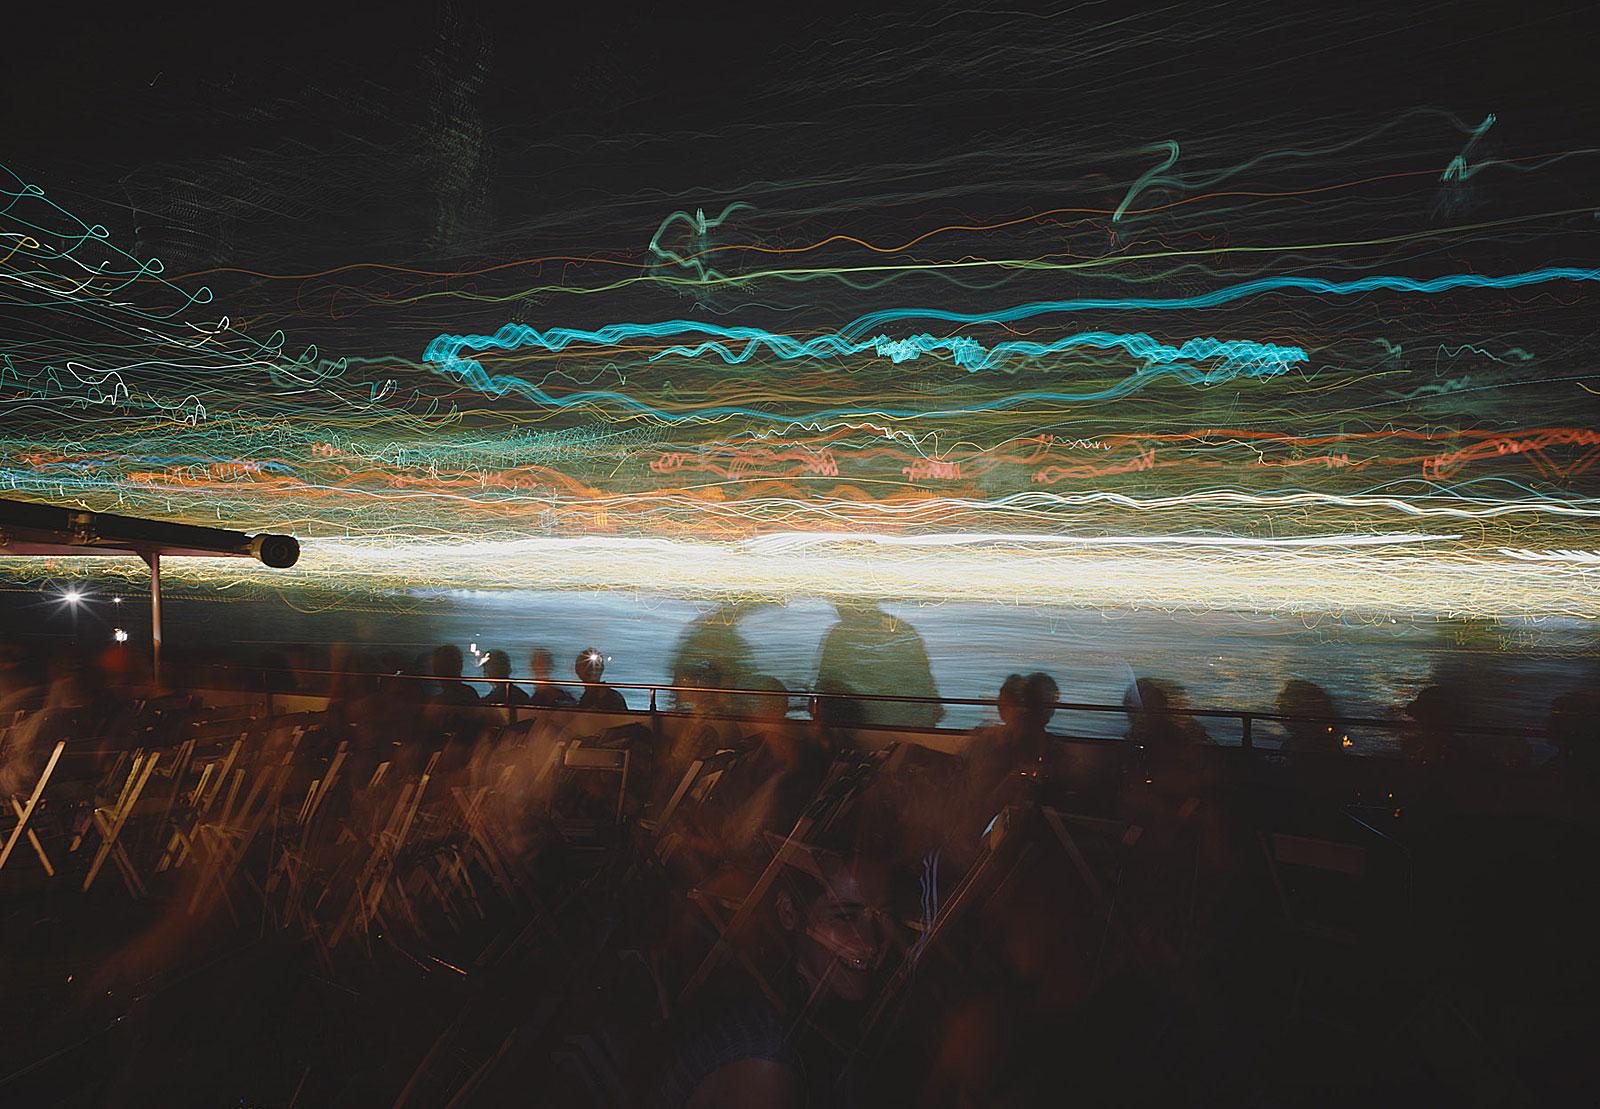 Seaport Music Cruise, New York (21.30 - 23.00 Uhr, 25.6.1998)